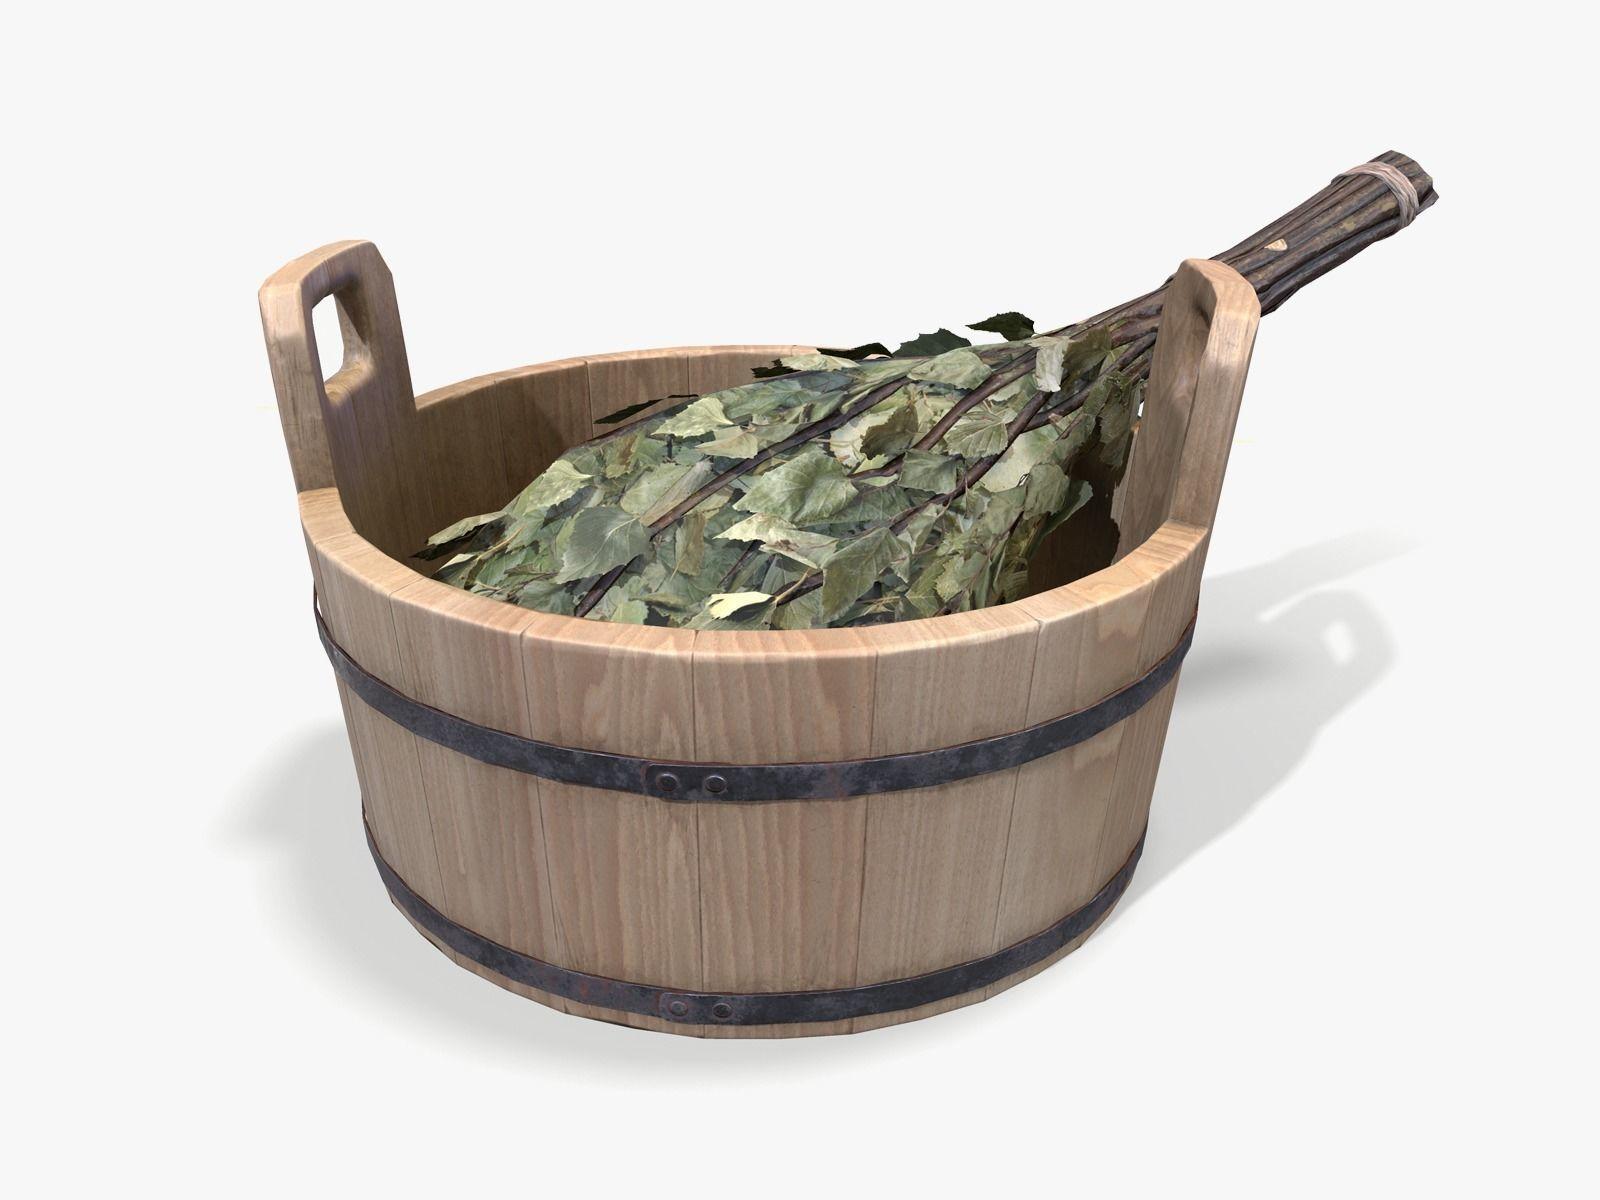 Sauna Bowl and Birch Besom